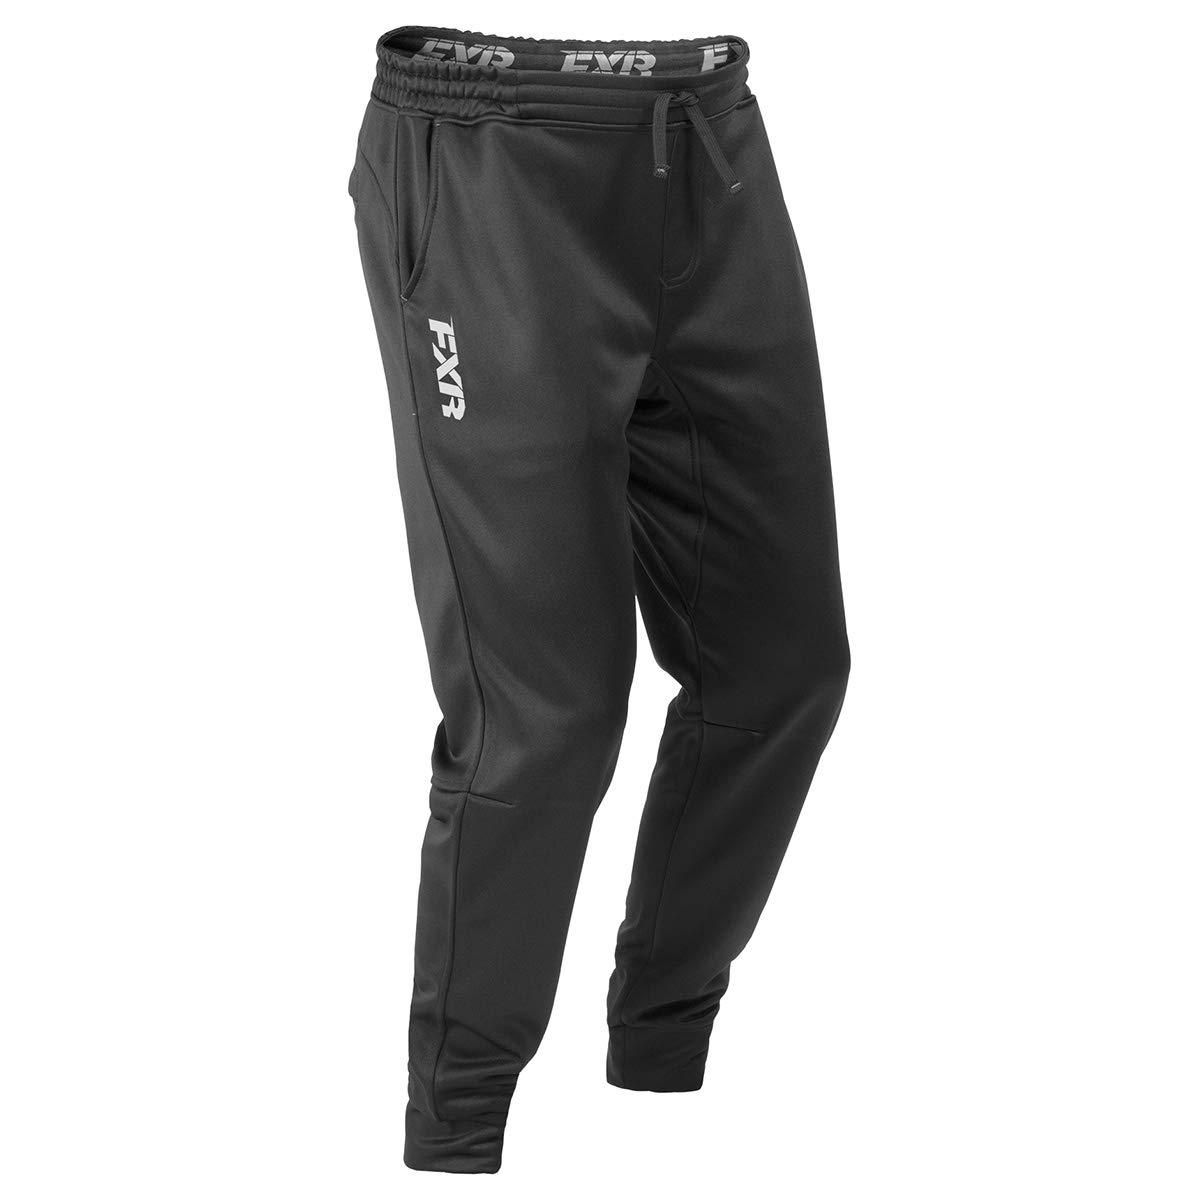 FXR Mens Elevation Tech Pant (Black Ops, 2X-Large) by FXR